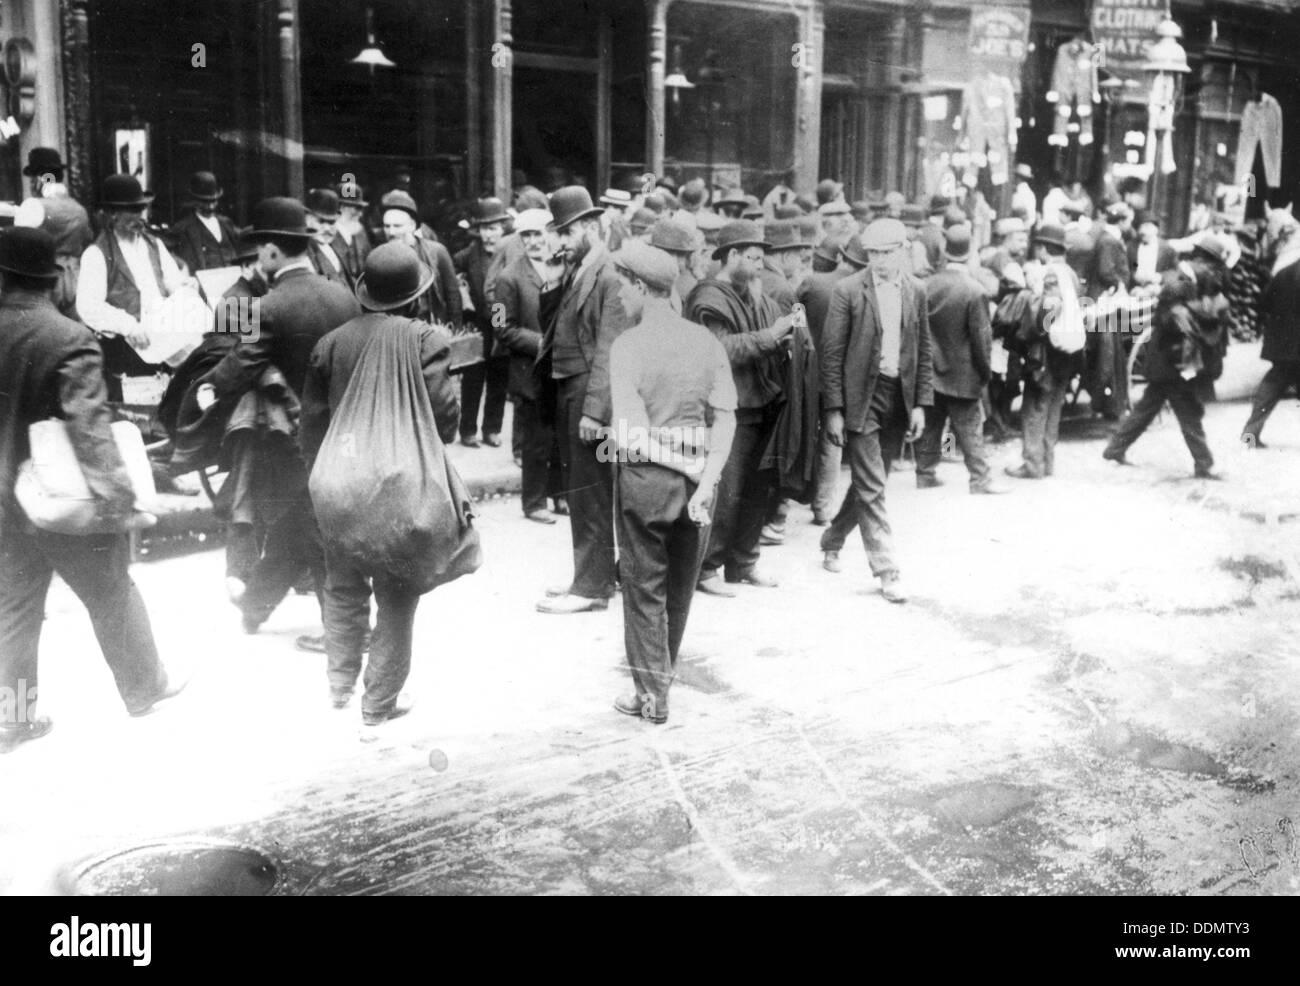 Jewish pedlars on the East Side, New York, USA, 1890s. - Stock Image